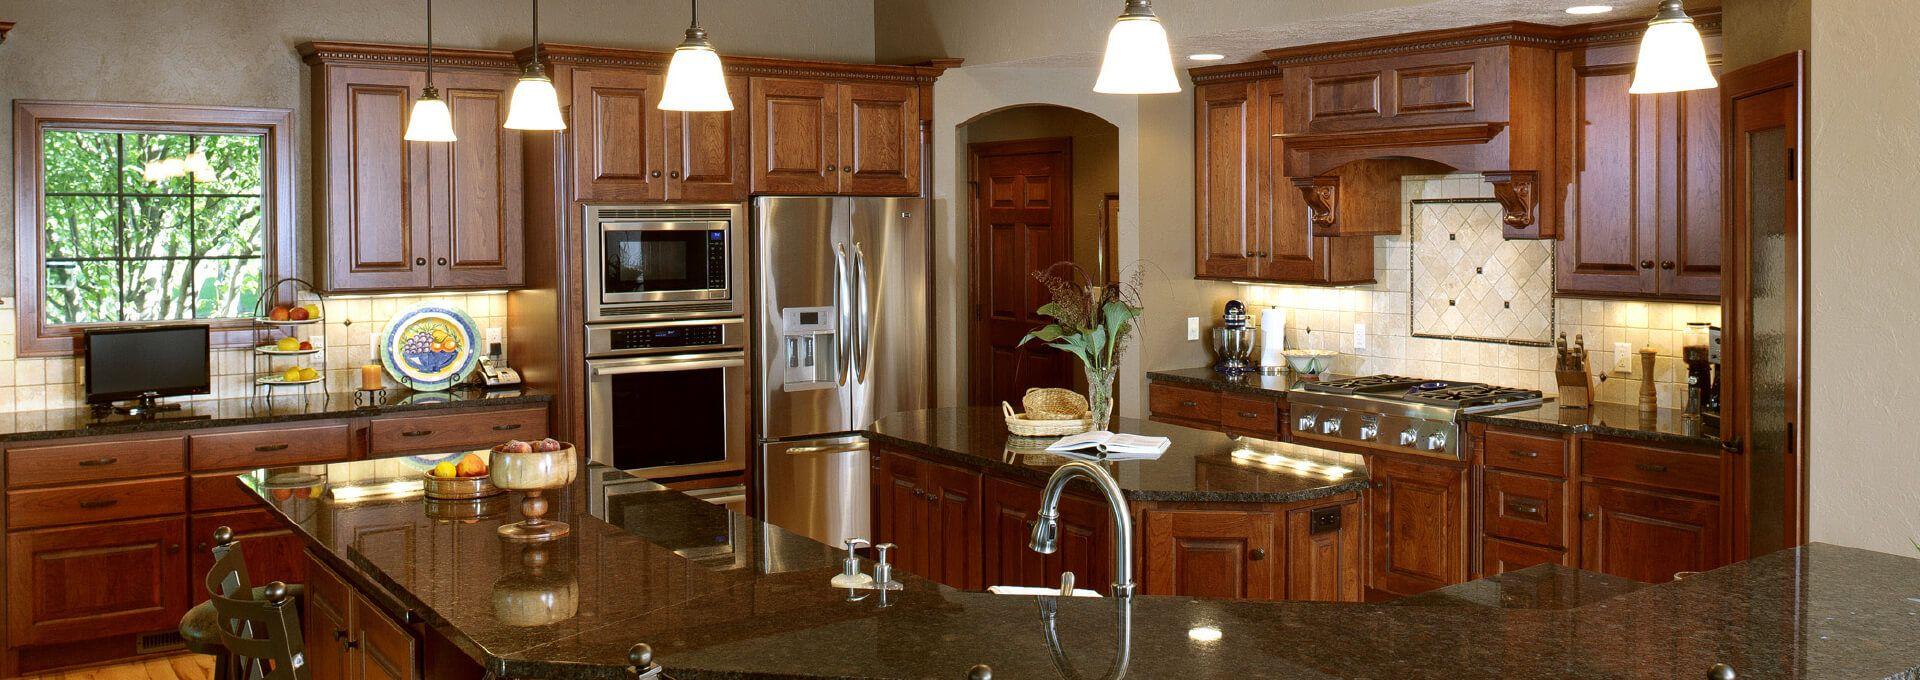 20 Wholesale Kitchen Cabinet Distributors Inc Decoracion Cocina Decoracionhogar99 In 2020 Kitchen Cabinets And Countertops Kitchen Cabinet Styles Kitchen Express